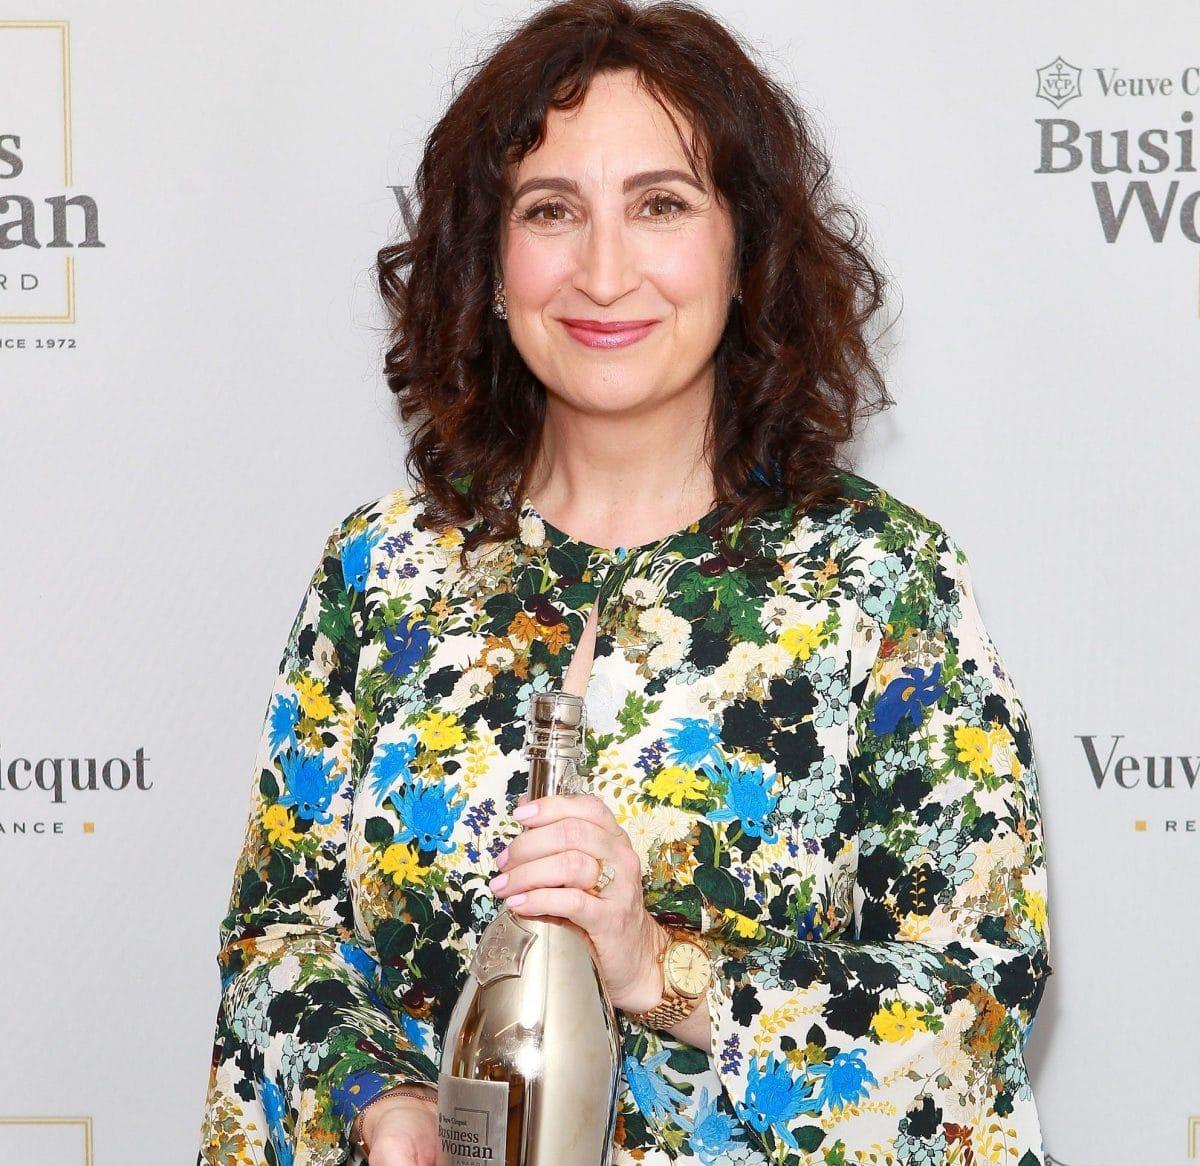 Co Op Ceo Jo Whitfield Wins Business Woman Award Retail Gazette